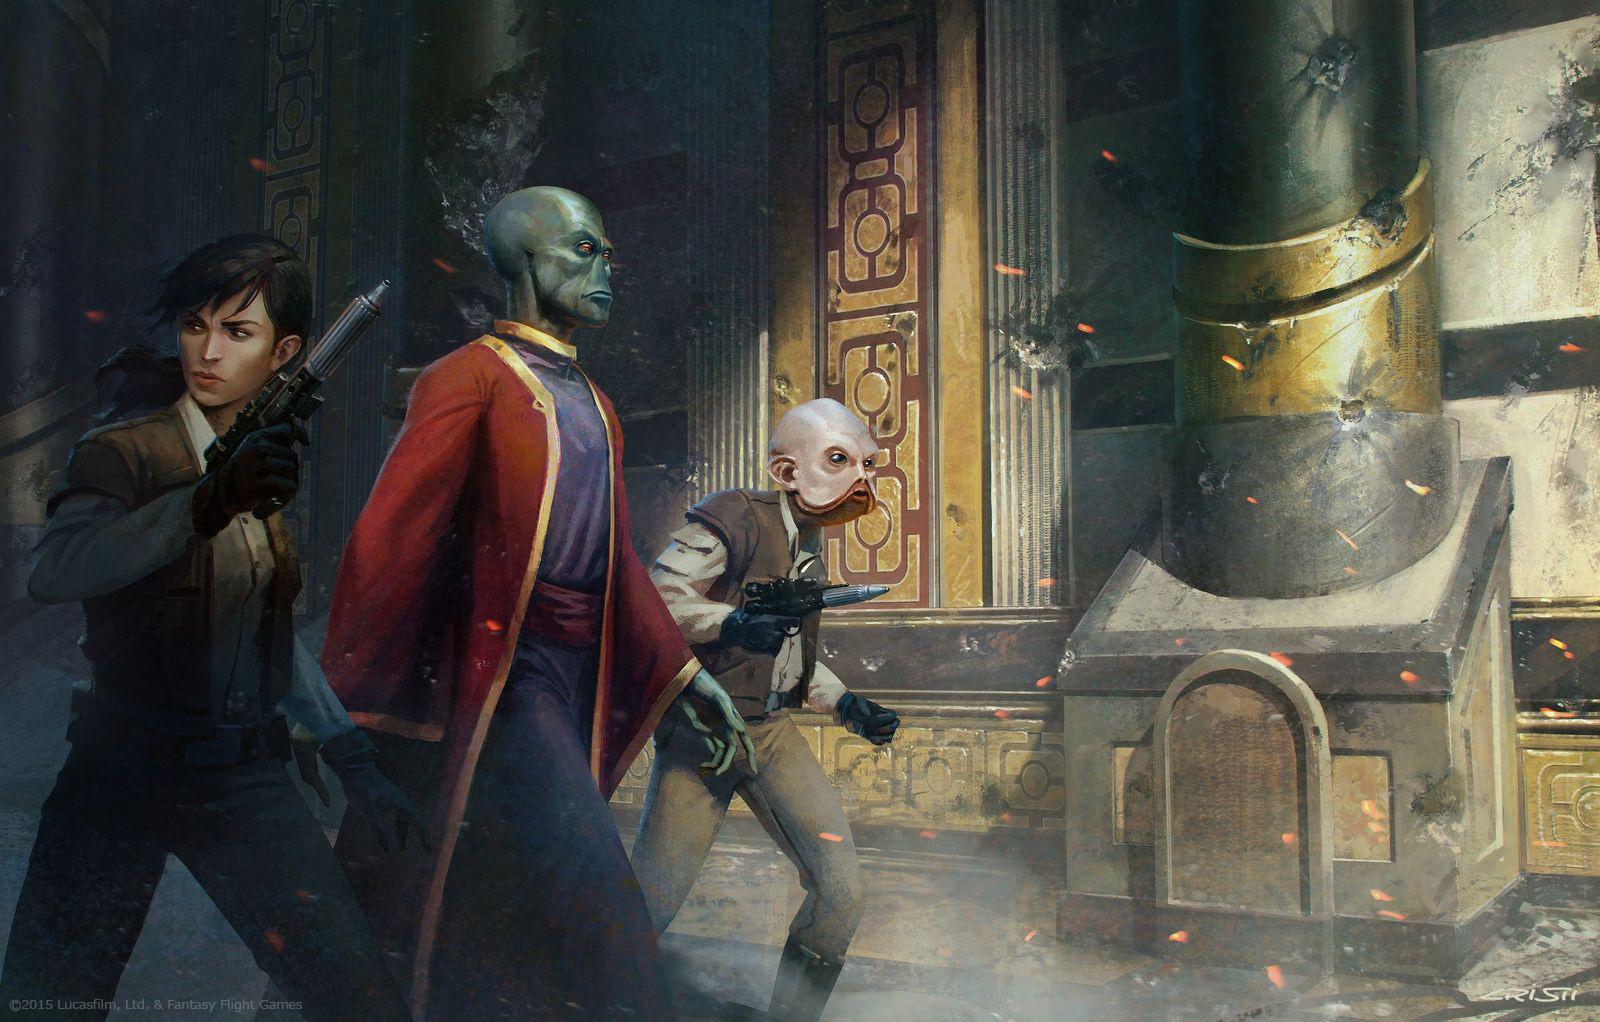 Star Wars RPG Illustrations by Cristi Balanescu